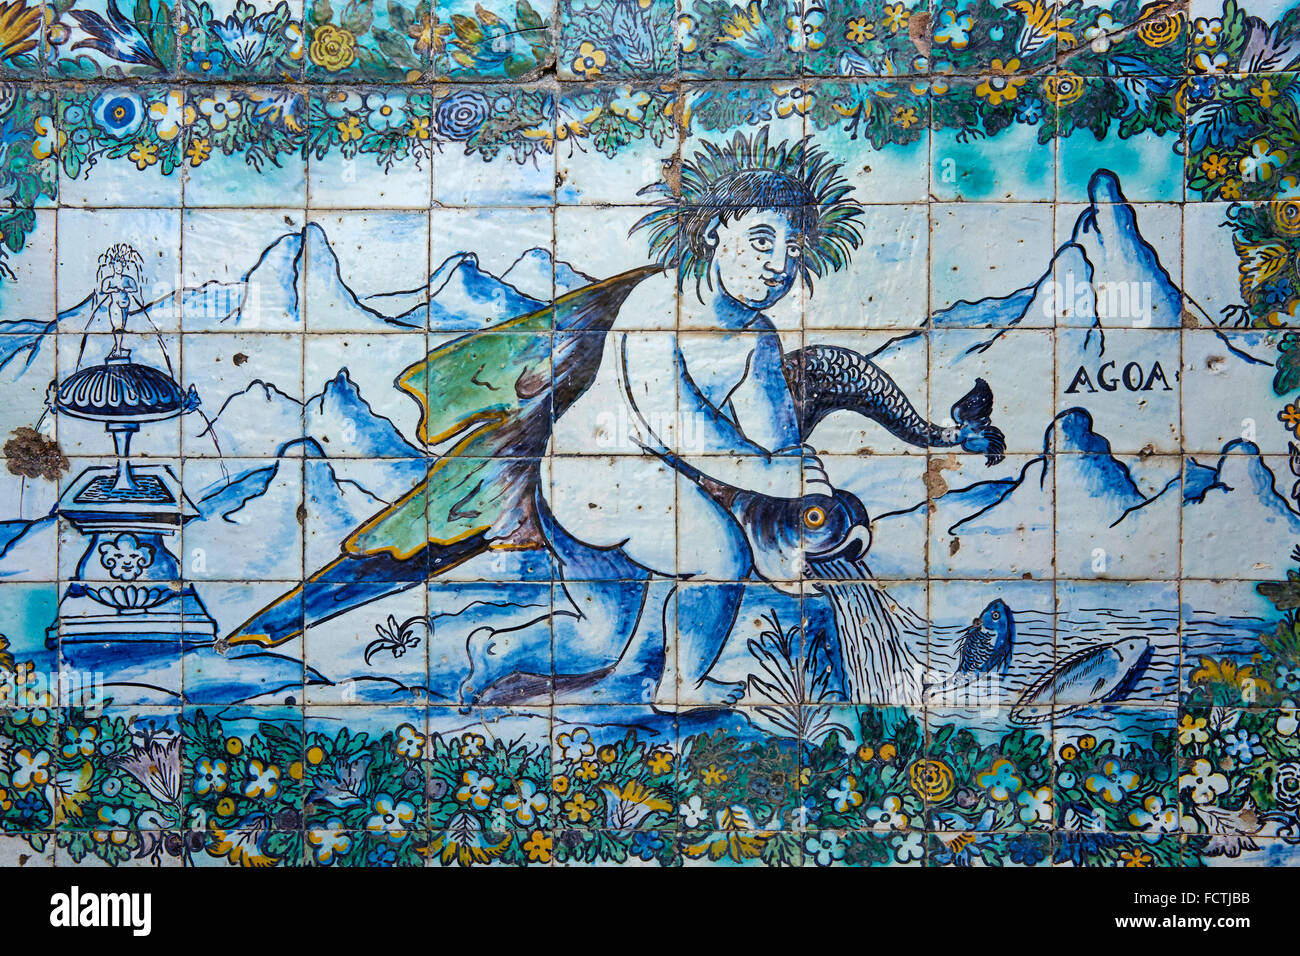 Portugal, Lisbon, Palacio dos Marqueses de Fronteira, azulejos ceramics tiles - Stock Image